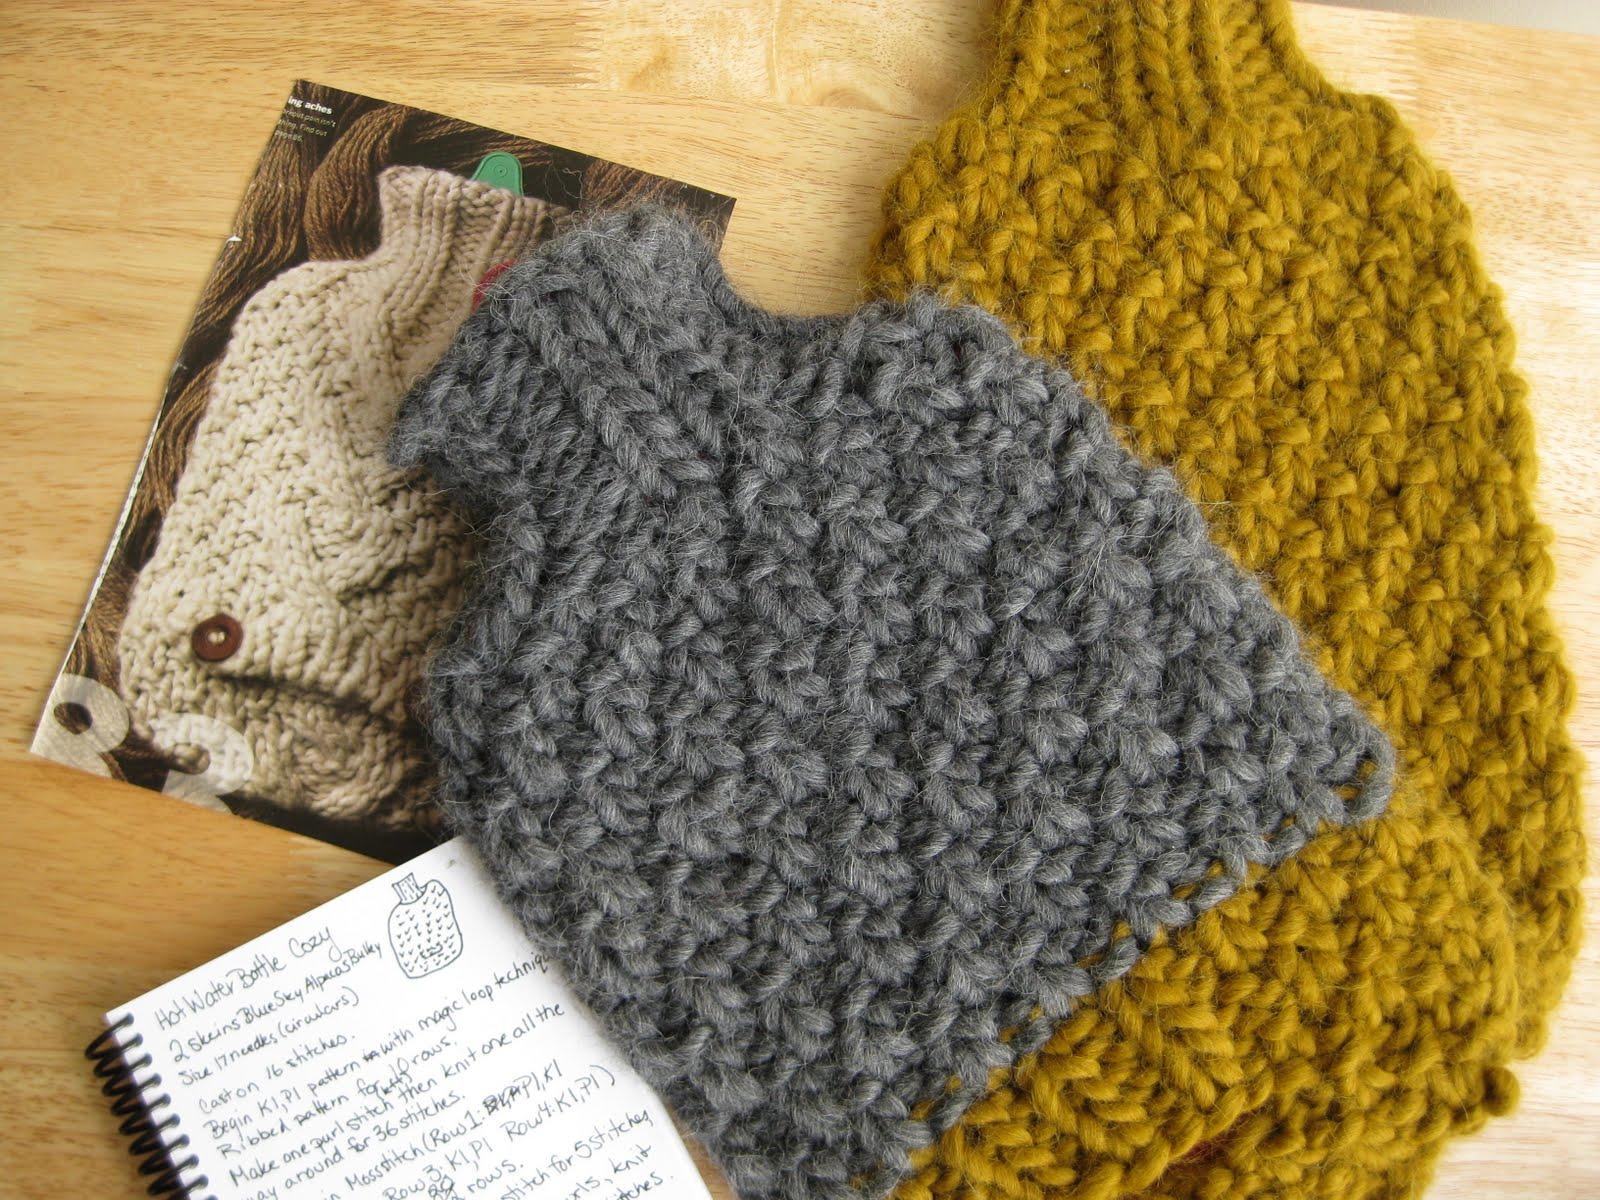 Knitting Pattern For Hot Water Bottle Cozy : erica knits: November 2009